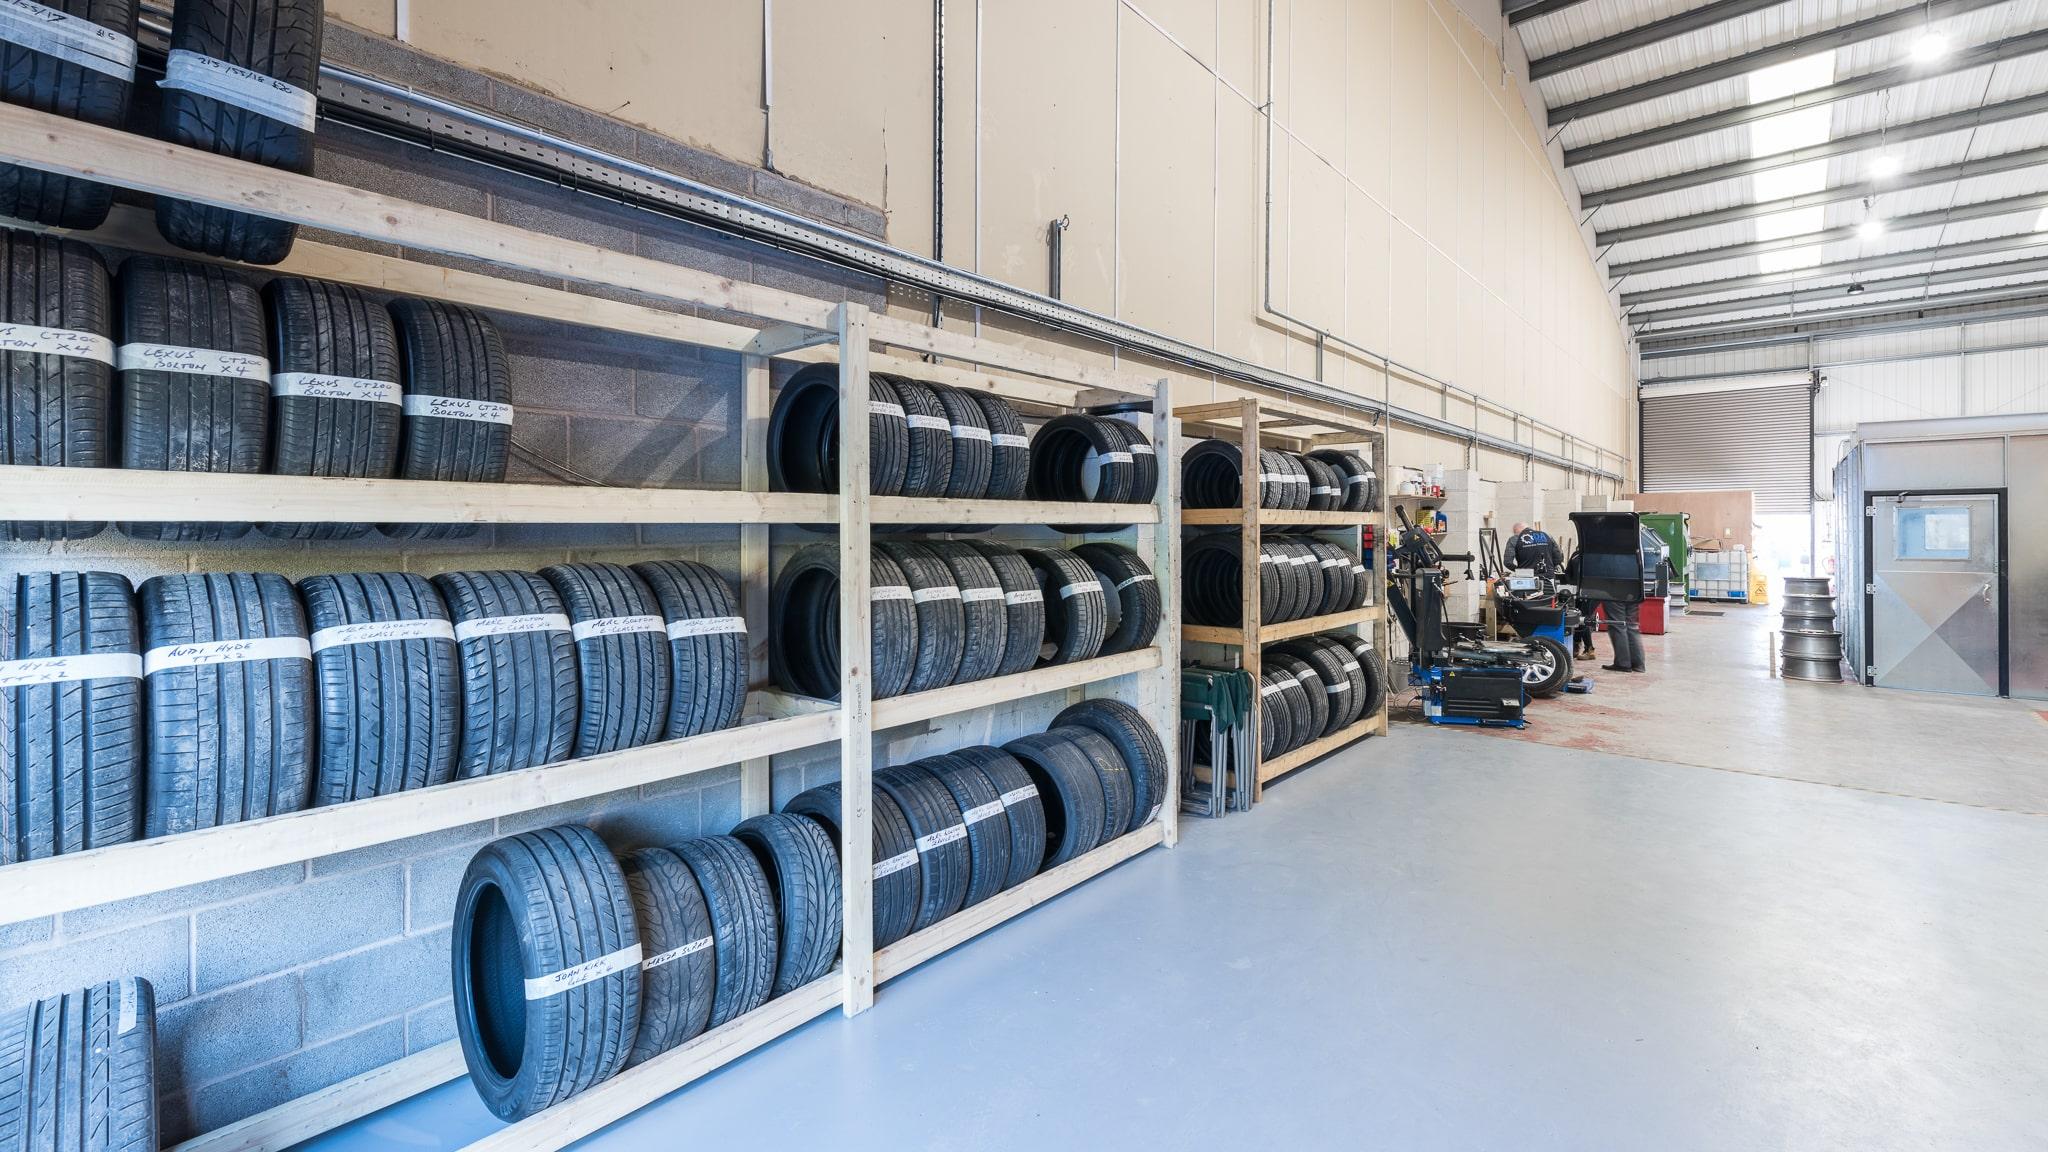 The DA Techs new unit in Adlington, Chorley